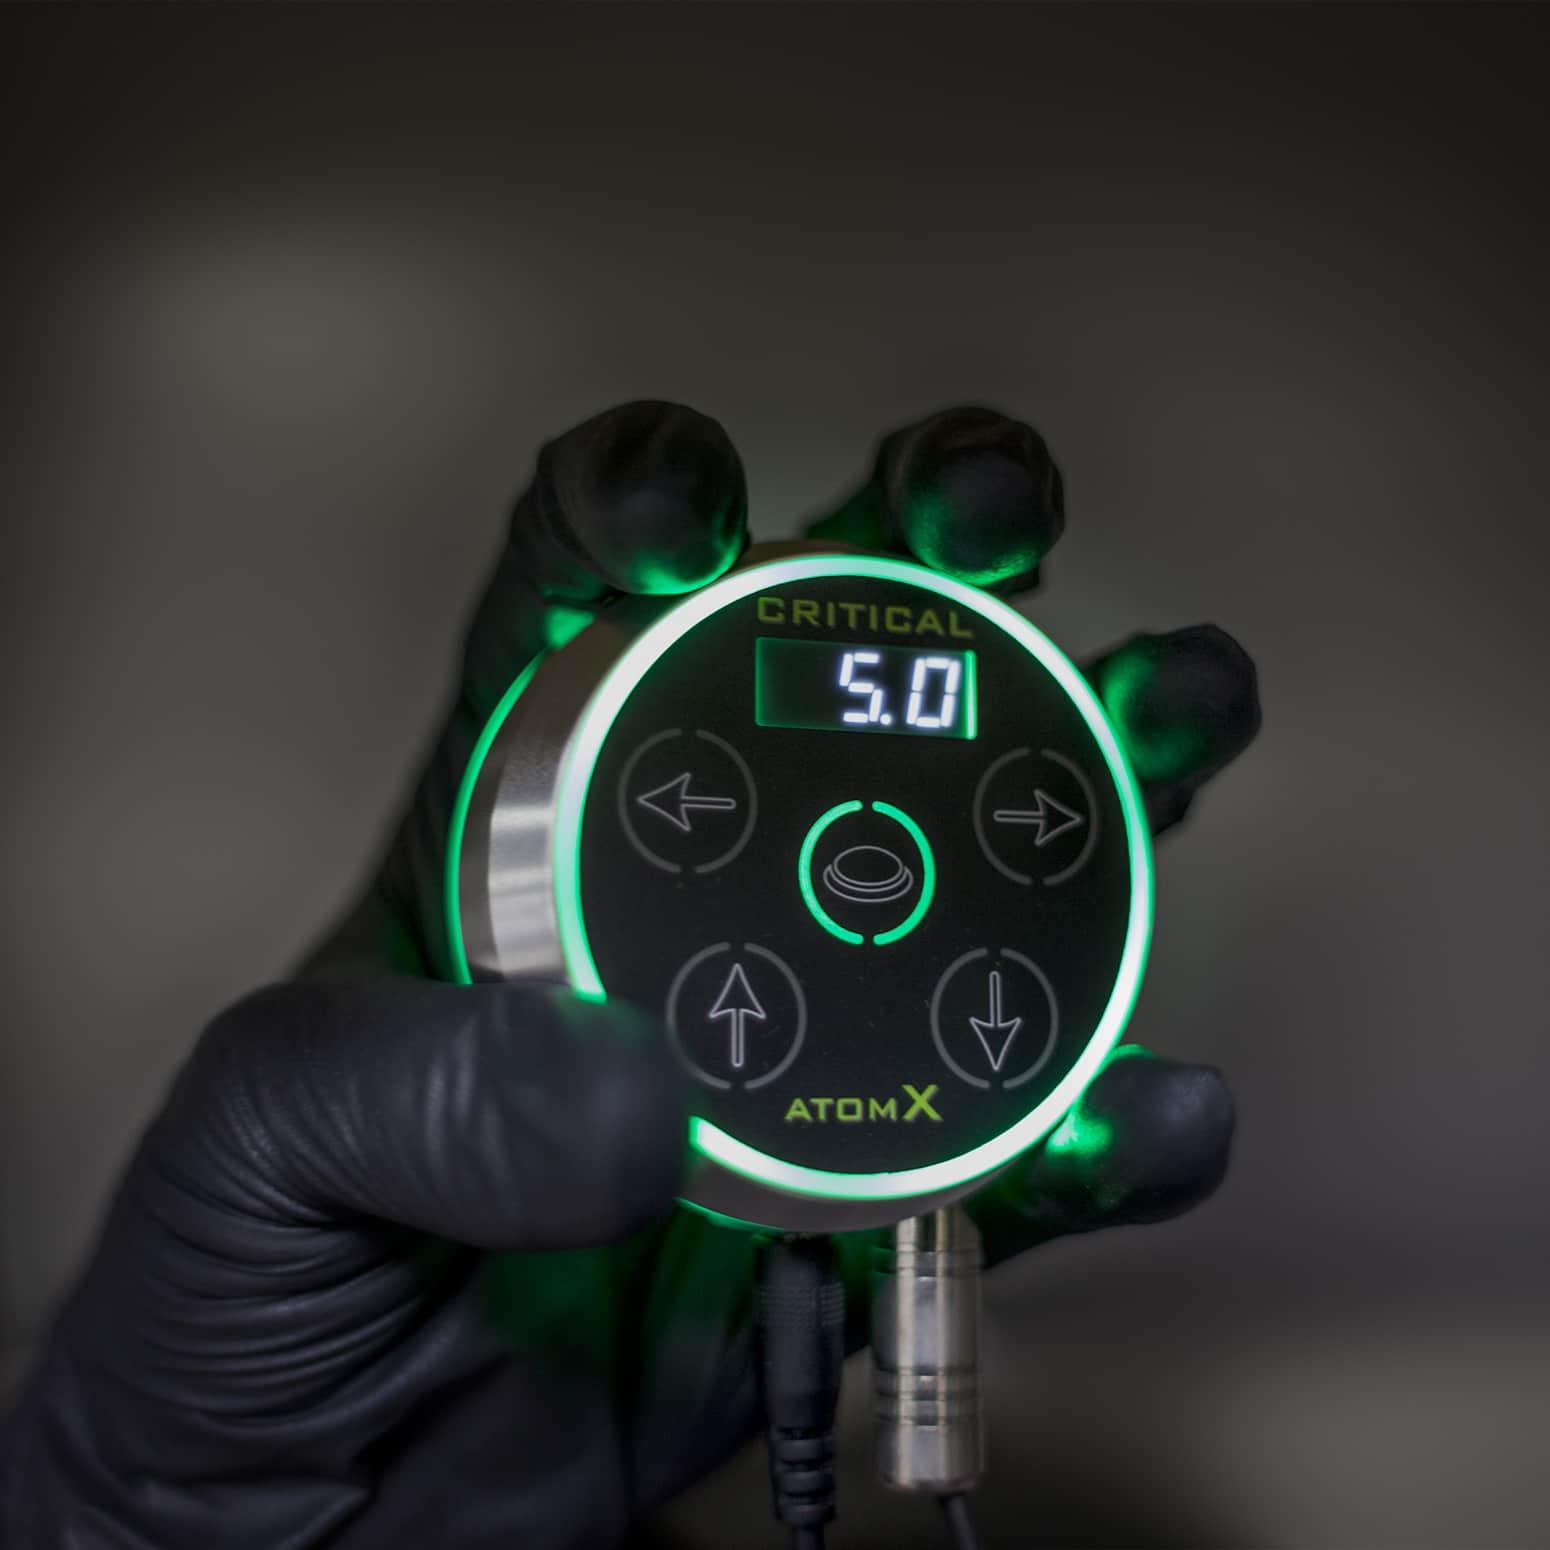 Critical Tattoo Power Supply Atom X 1